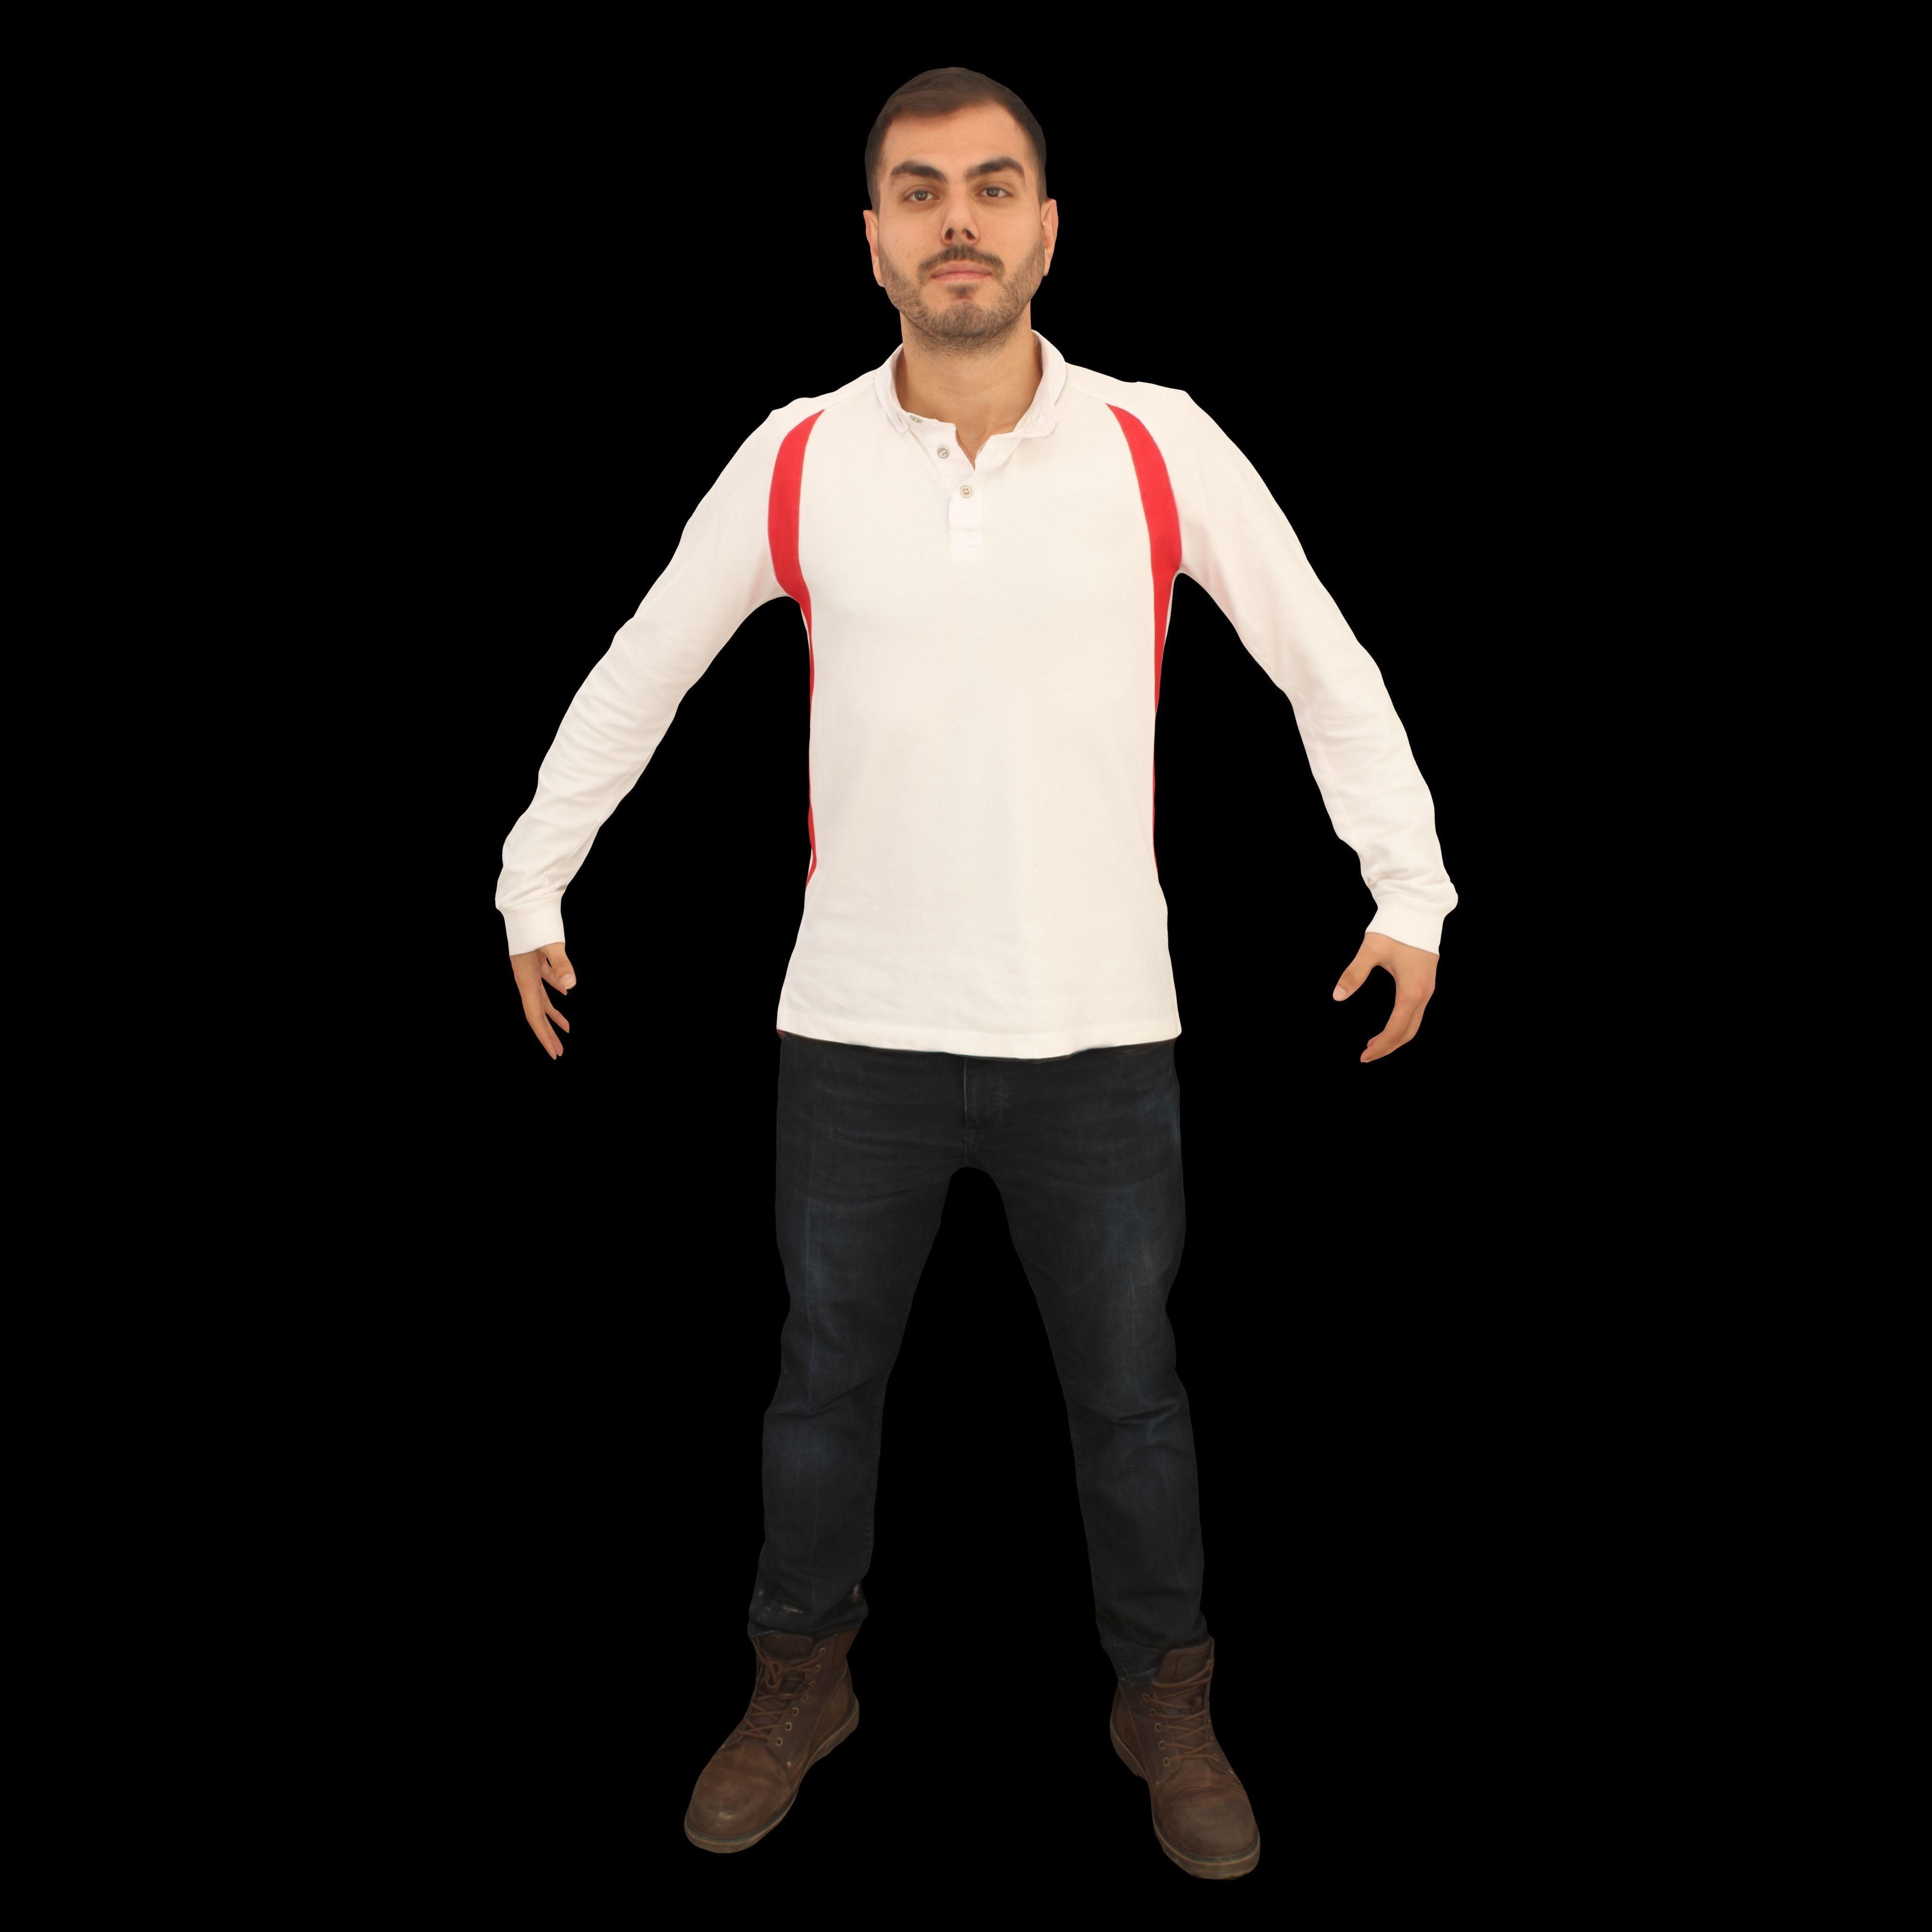 No453 - White Male A Pose